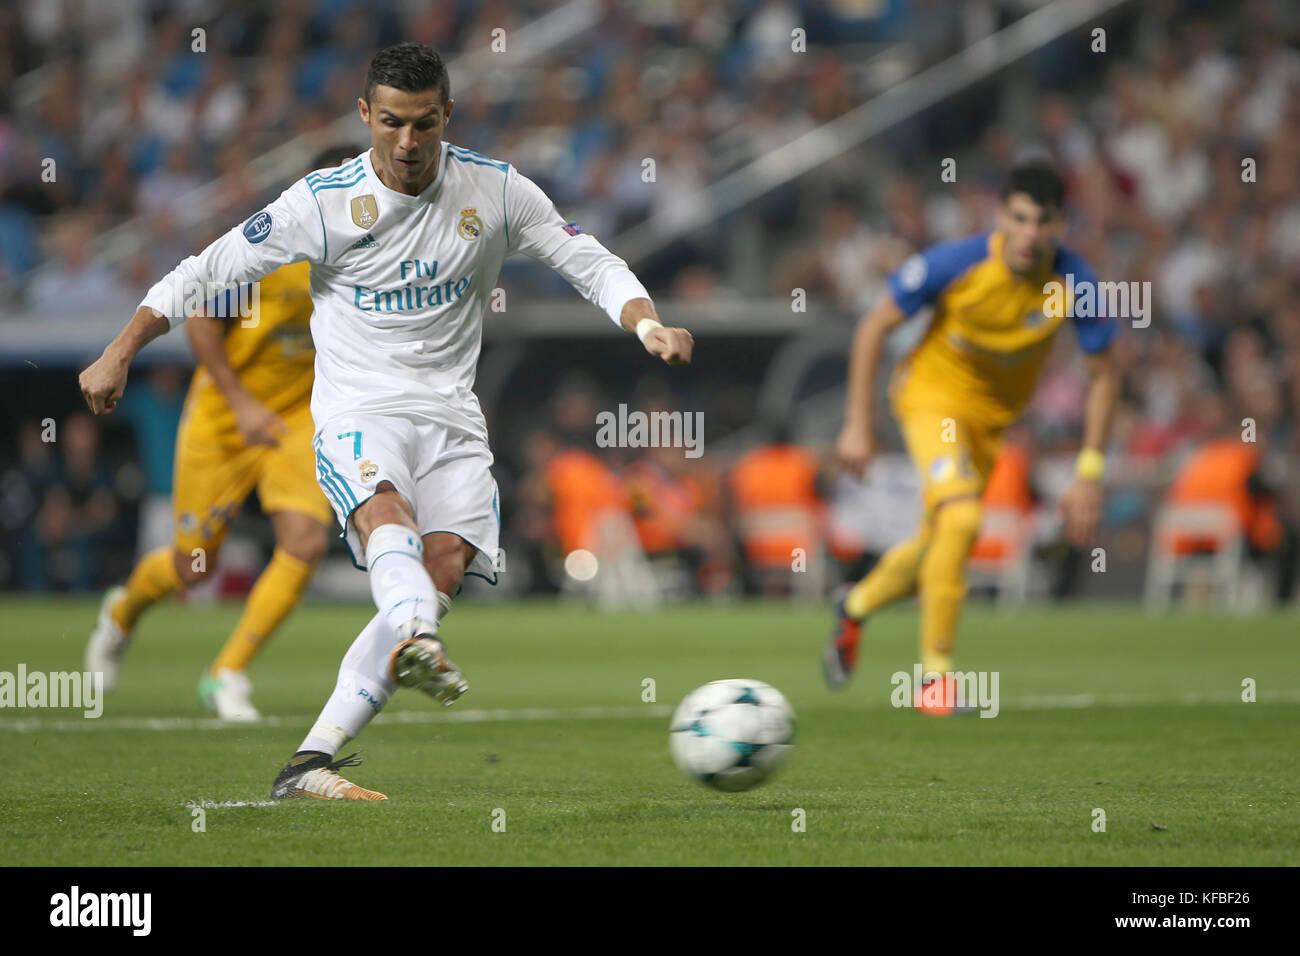 Madrid Spain Cristiano Ronaldo Scores 2 0 Shooting A Penalty Kick Stock Photo Alamy